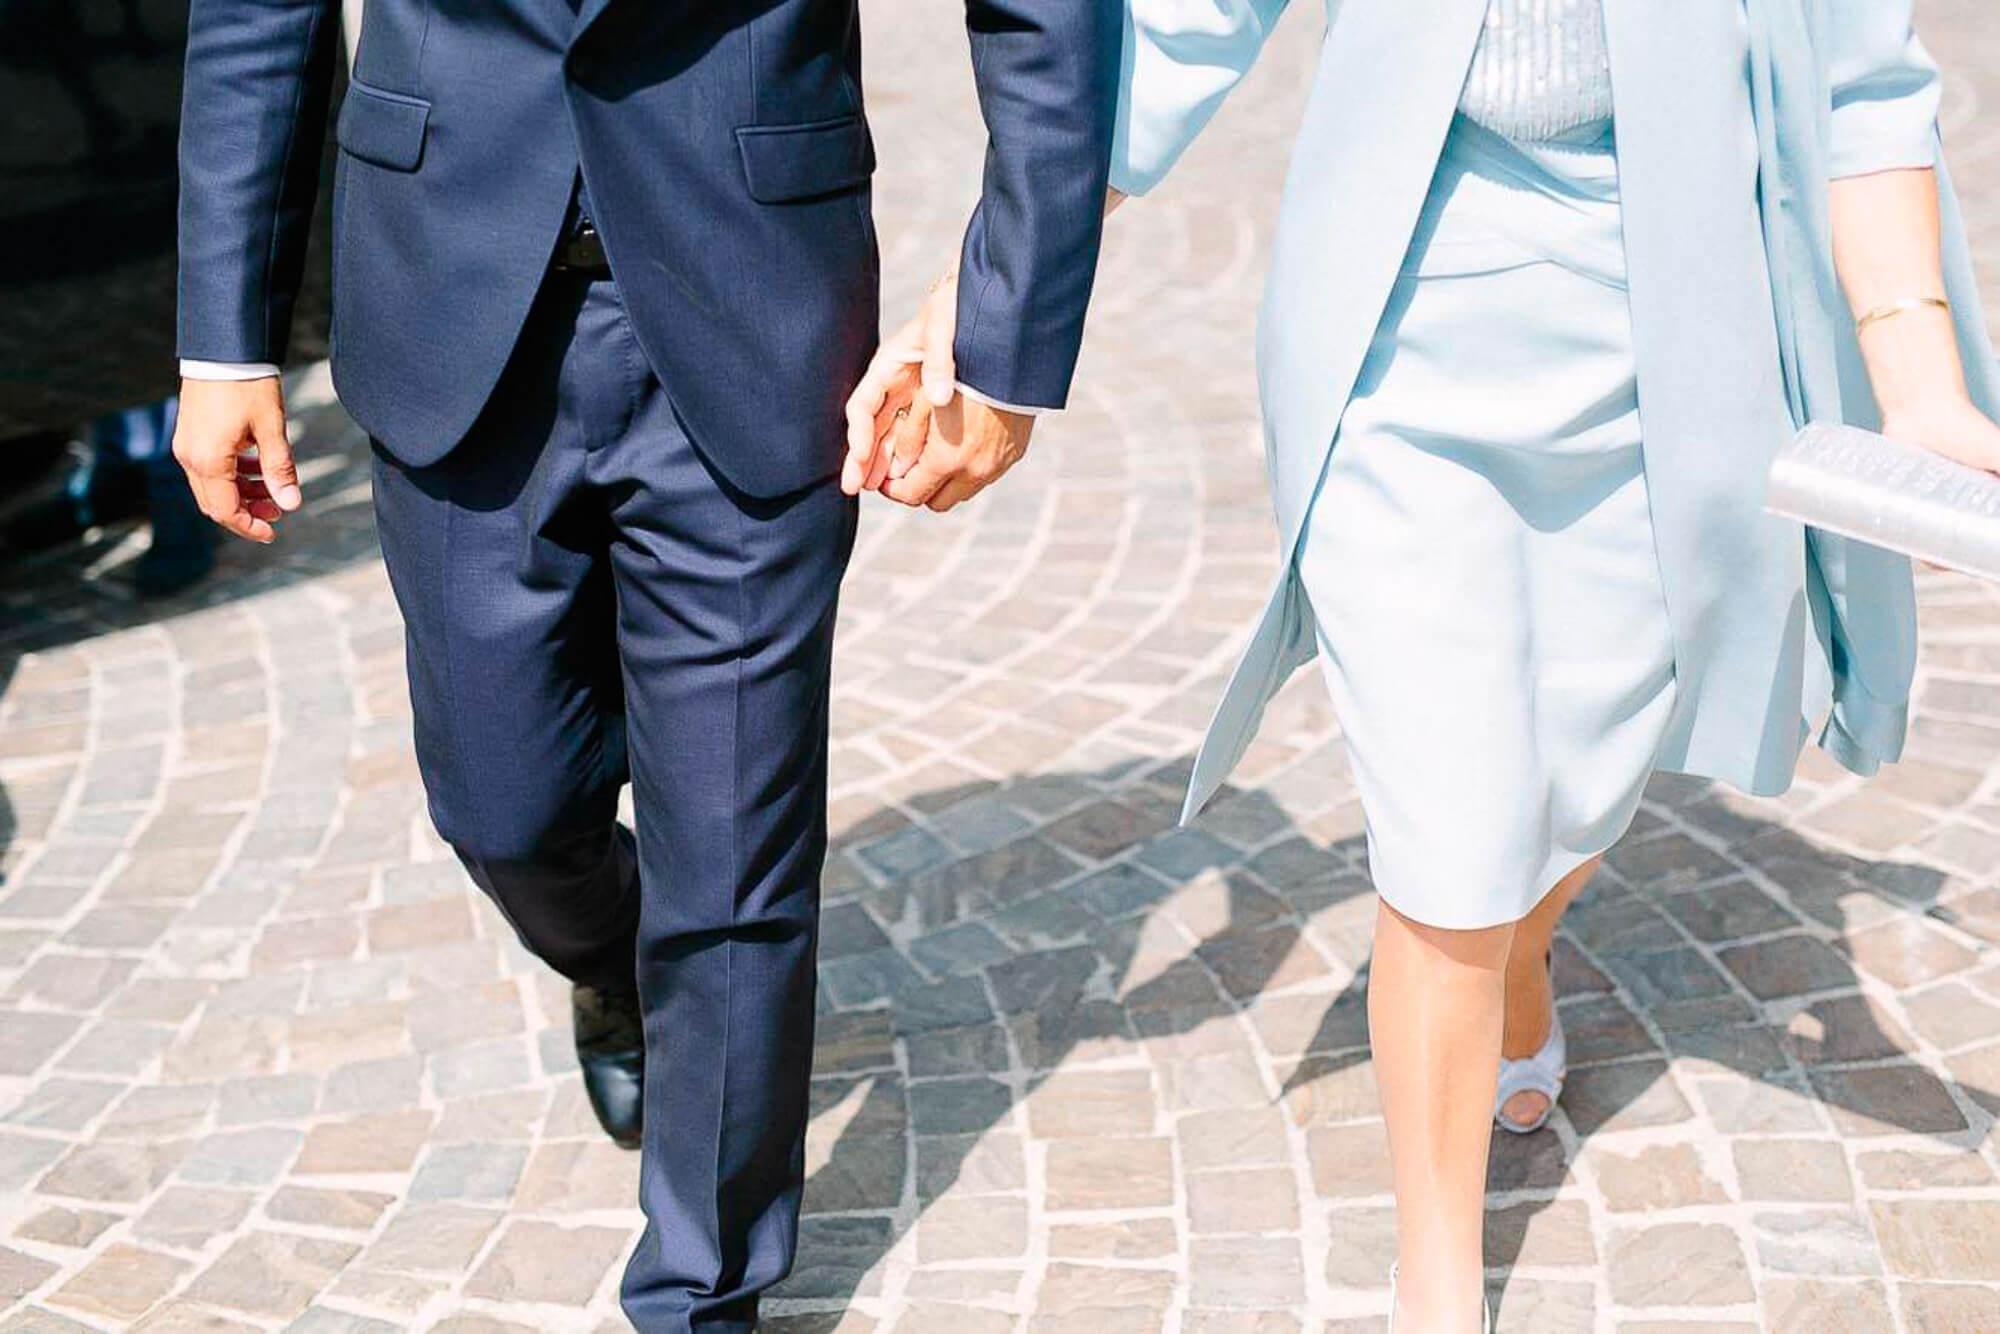 40_wedding_mother groom reportage.jpg